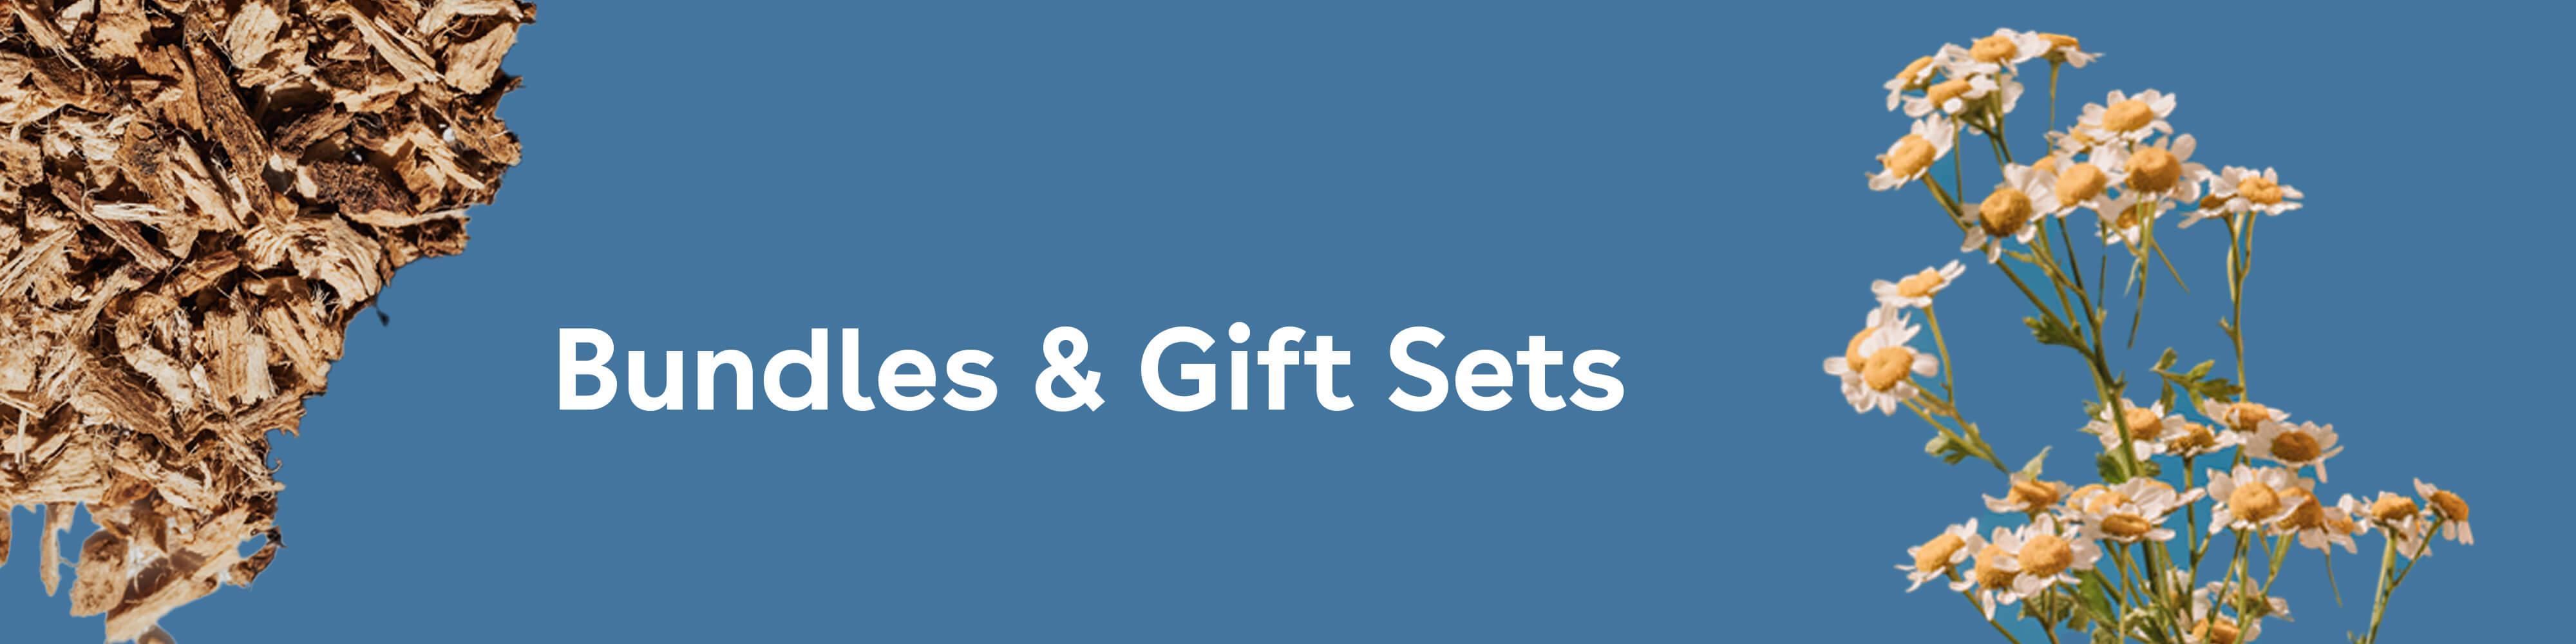 Nuria bundles and gift sets